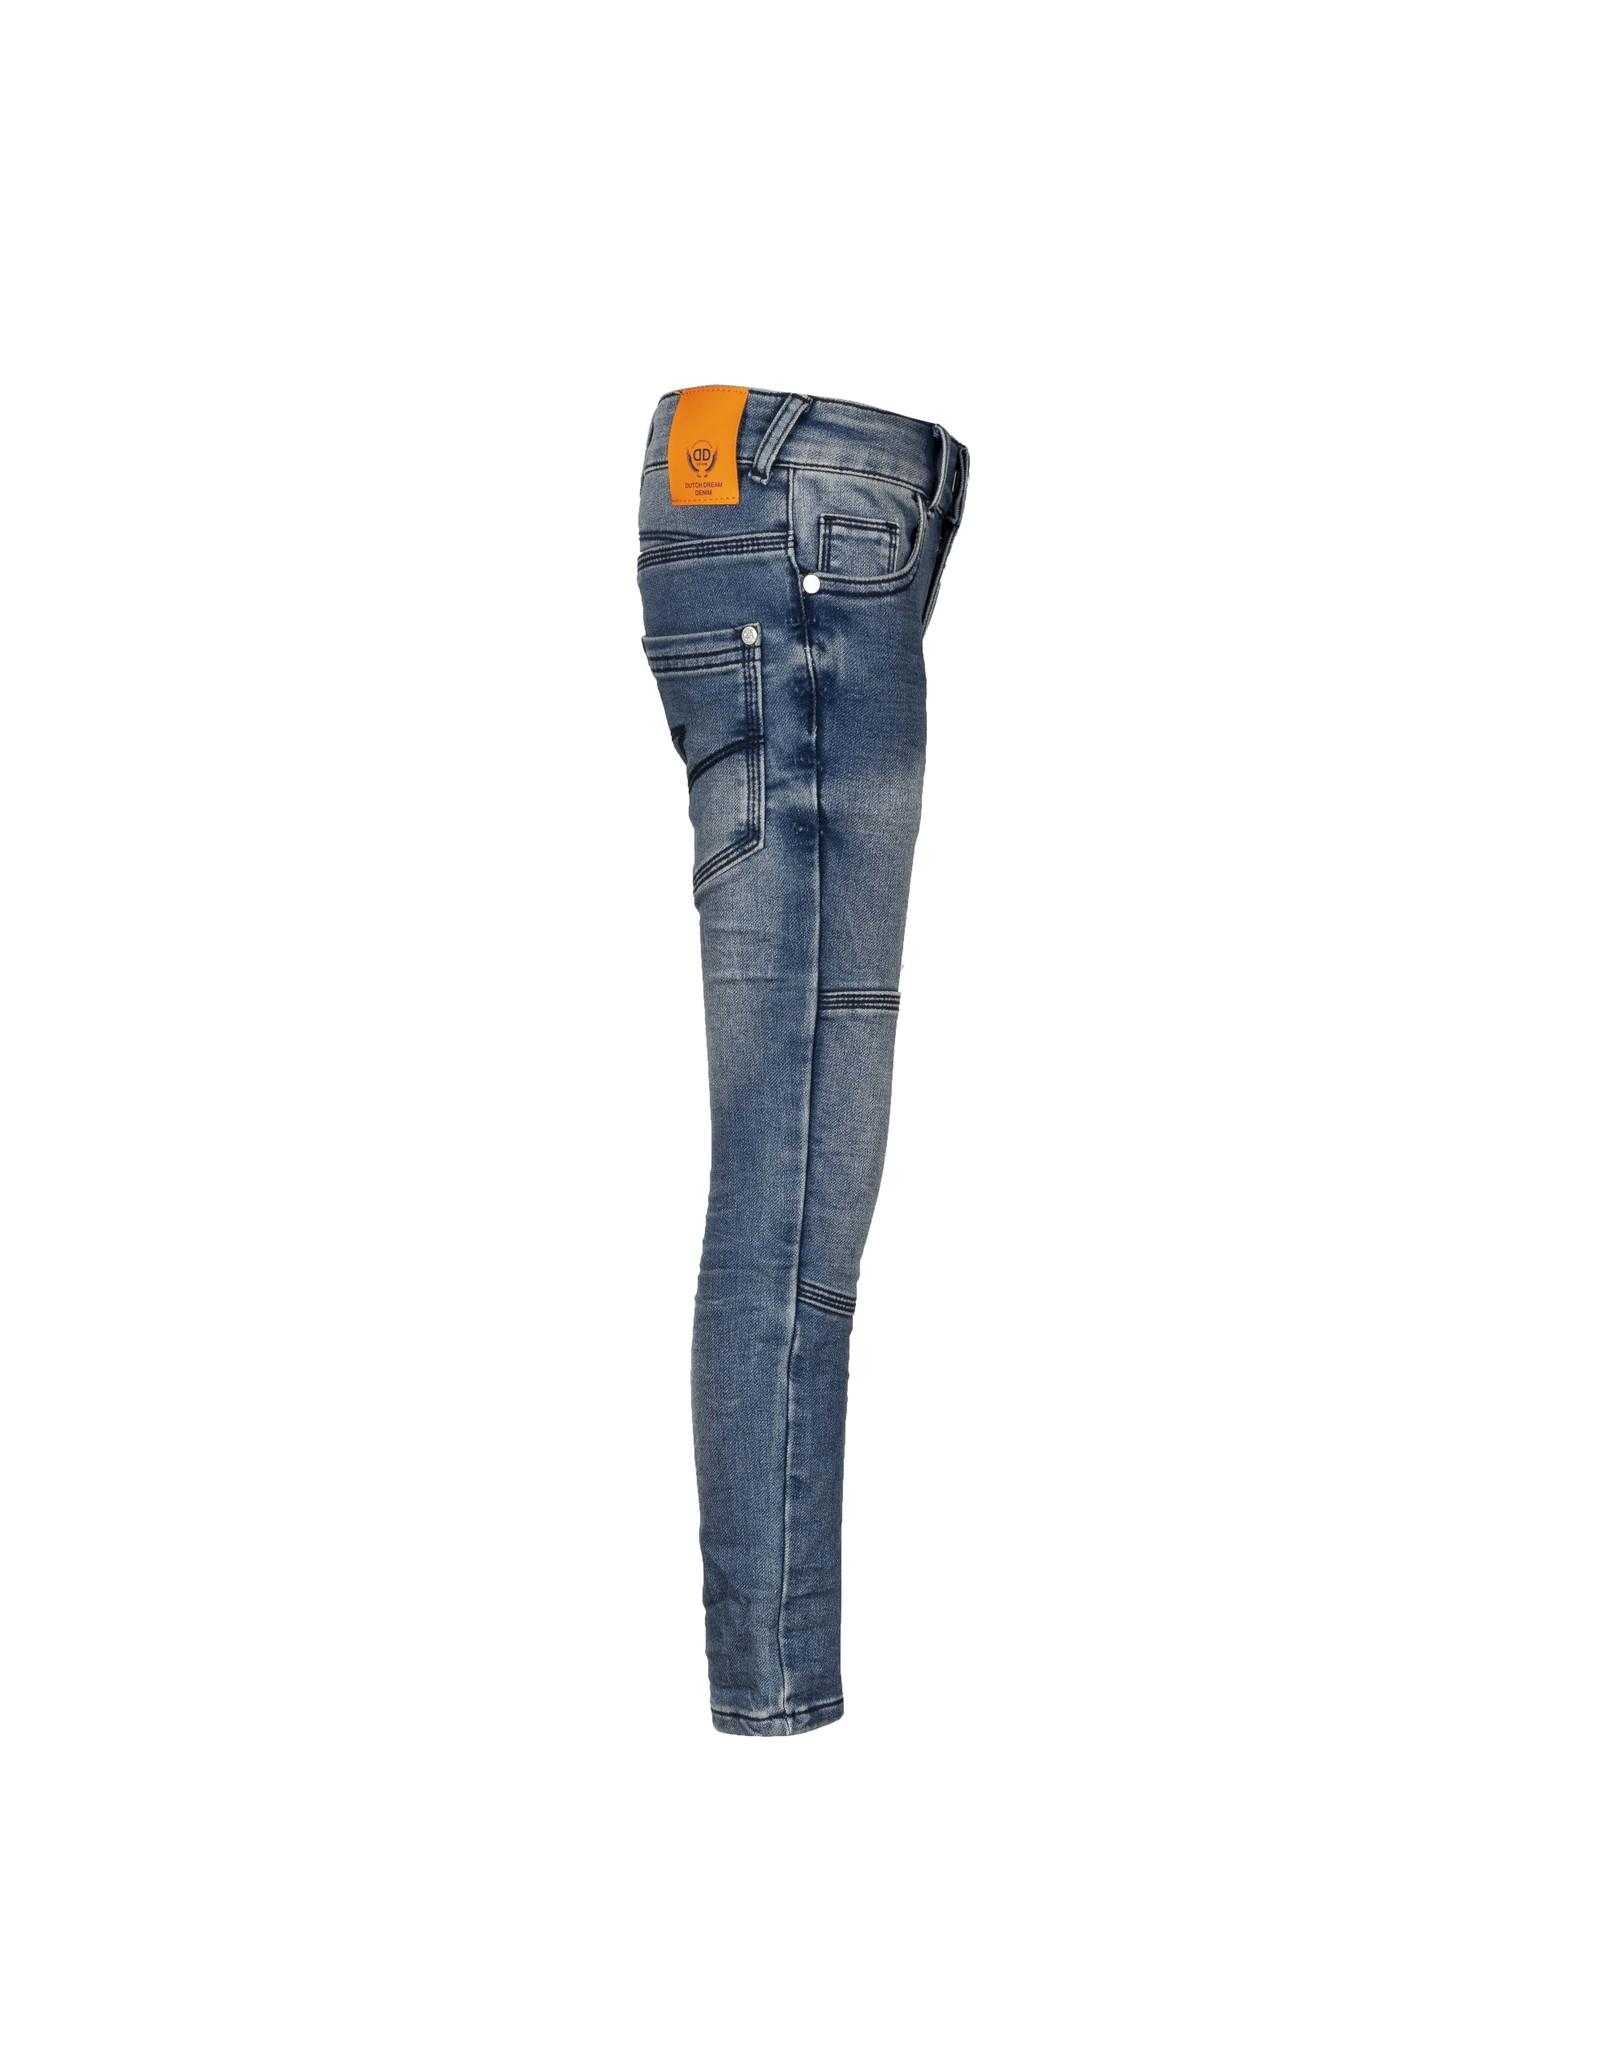 DDD DDD jongens extra slim fit jogg jeans Zile Blue